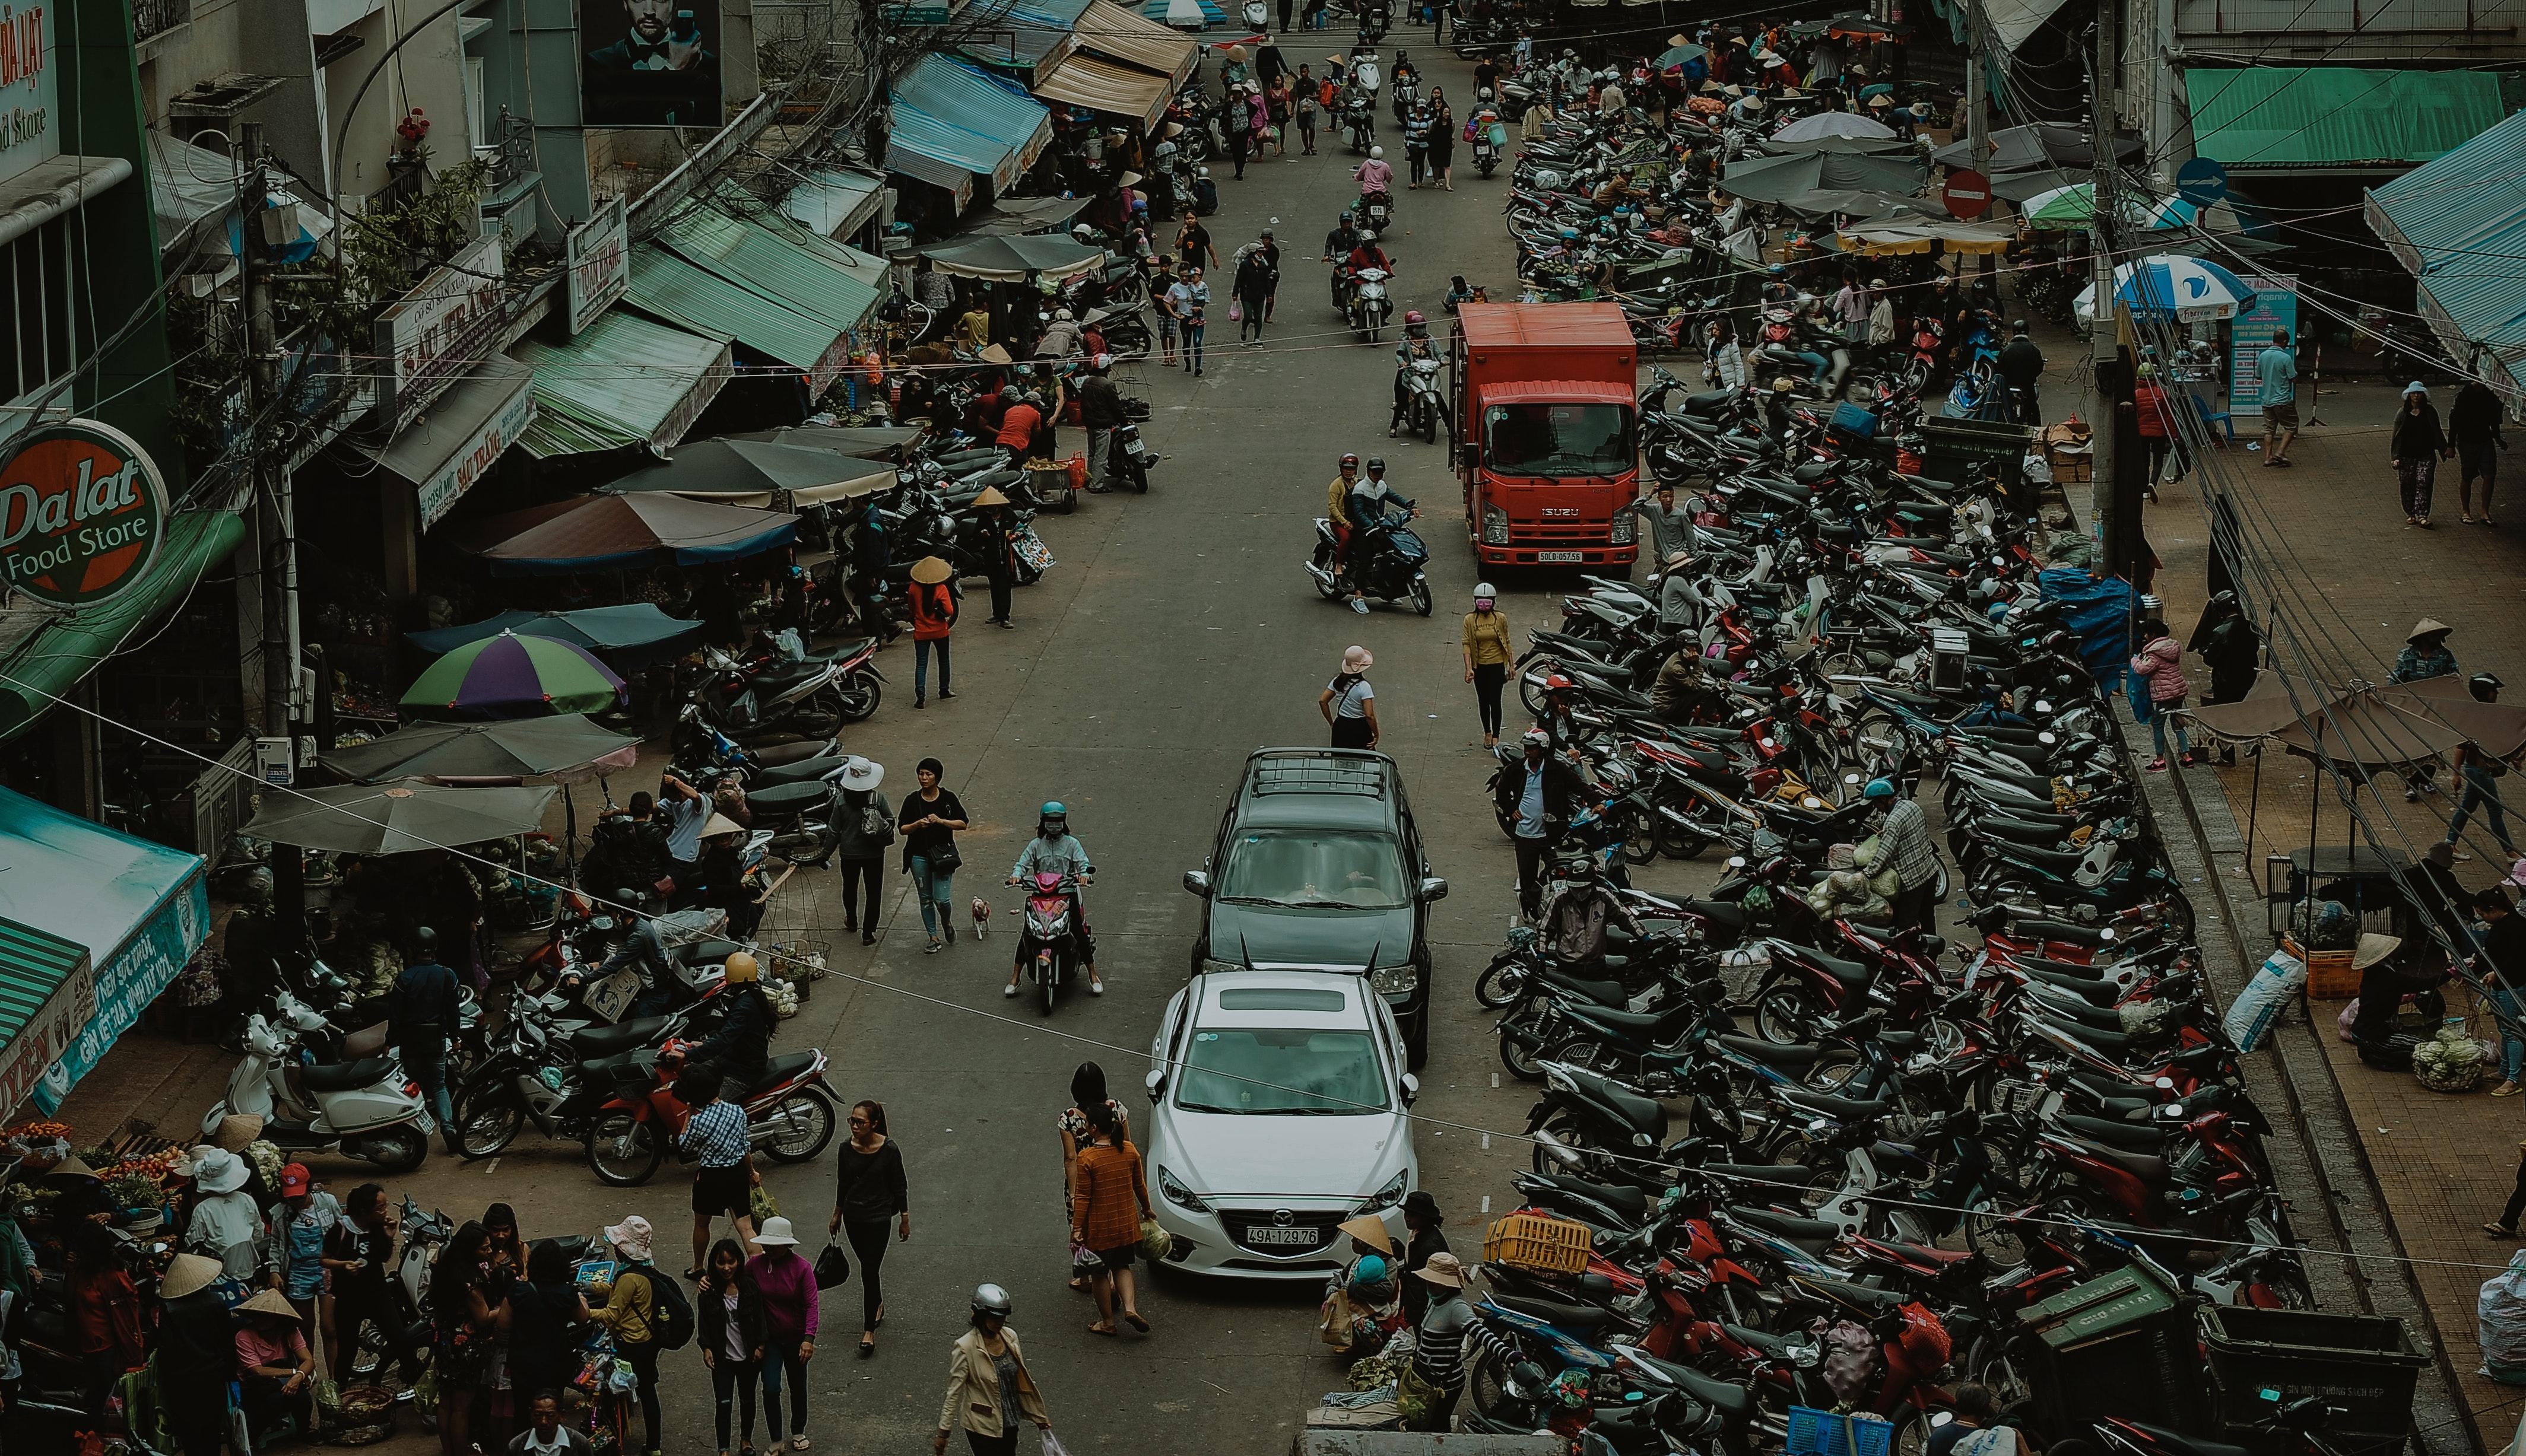 Group of People Walking Through Market, Outdoors, Walking, Vehicles, Urban, HQ Photo